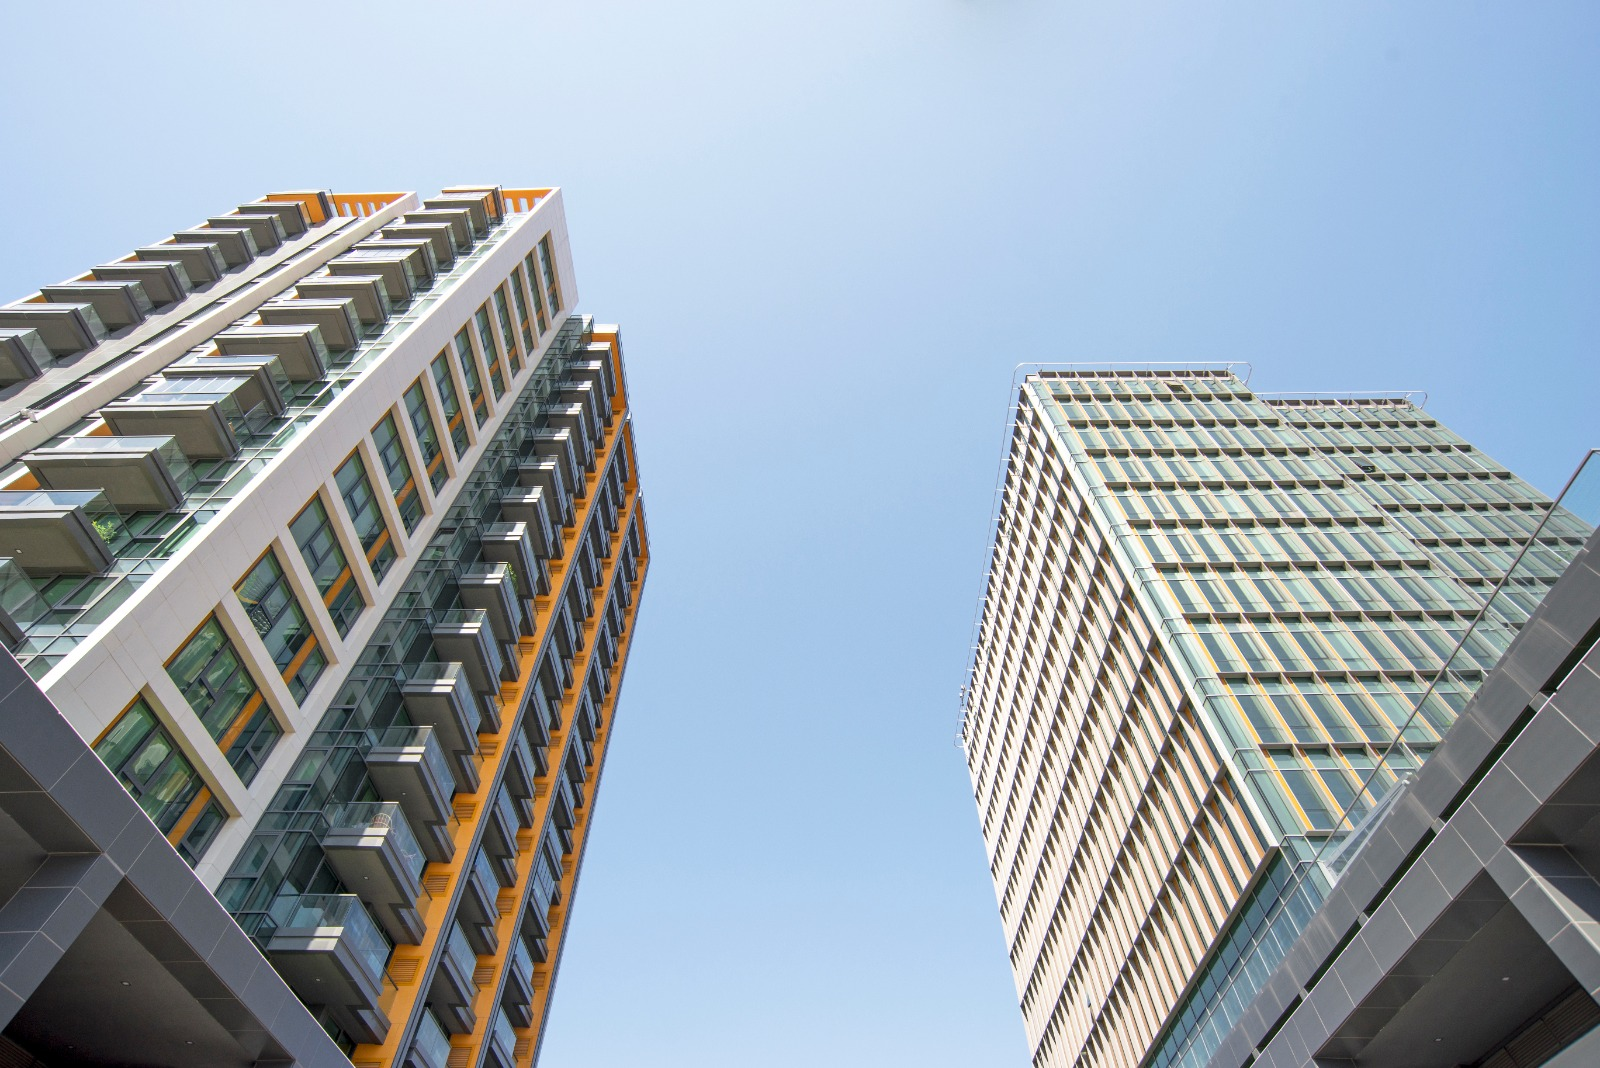 Бизнес-центр с жилыми апартаментами в Атакёе - Фото 3